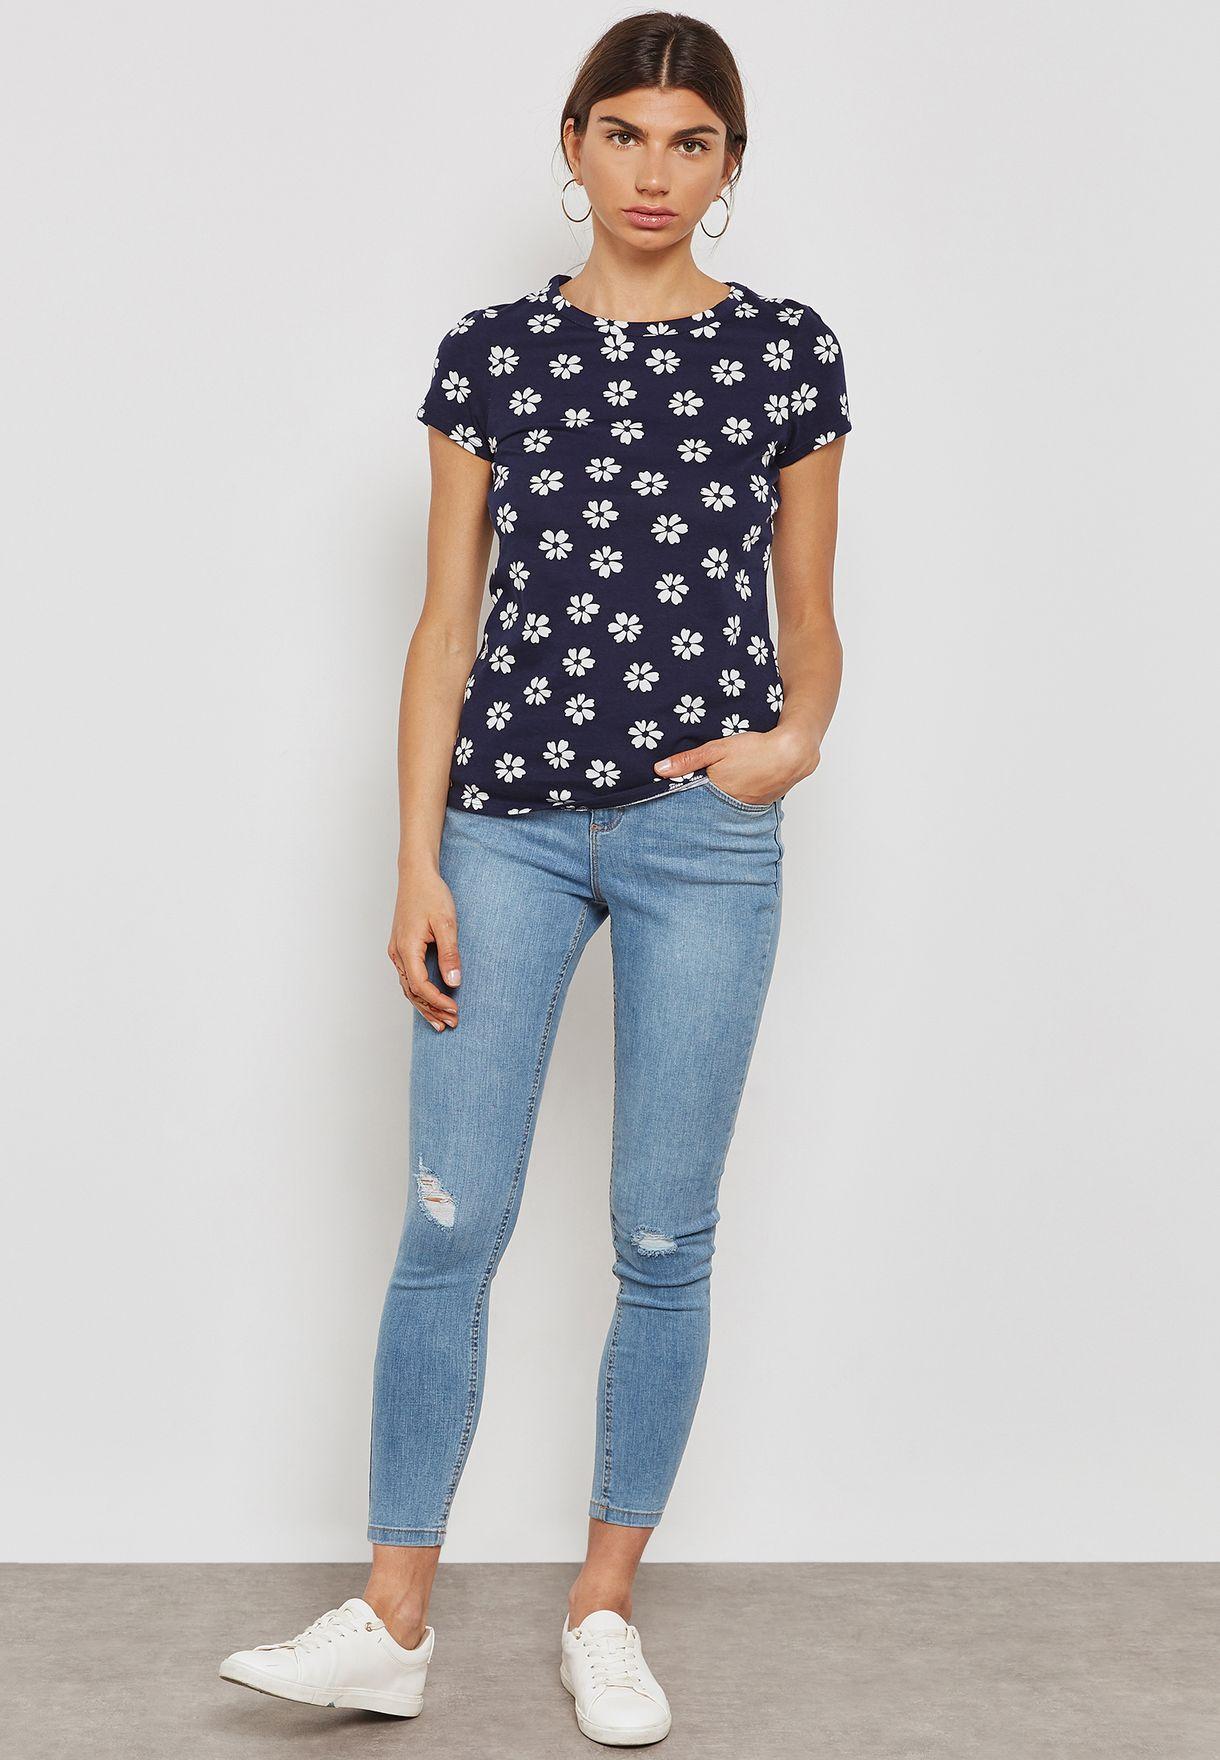 Geometric Floral Print T-Shirt